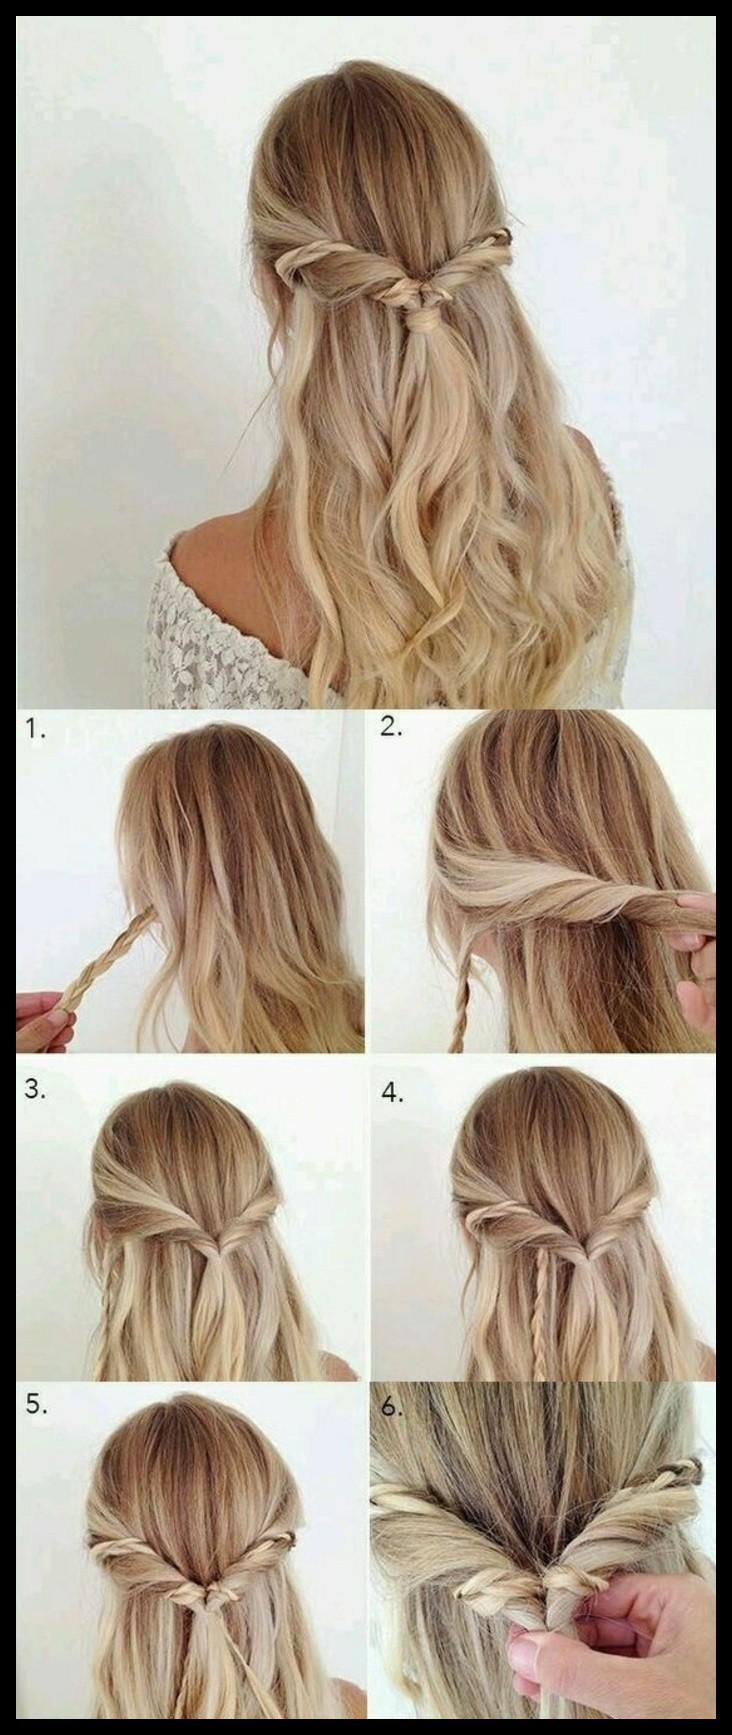 1001 Ideen Fur Schone Haarfrisuren Plus Anleitungen Zum Schone Frisuren Bea Haare Einfach Flechten Geflochtene Frisuren Leichte Frisuren Lange Haare